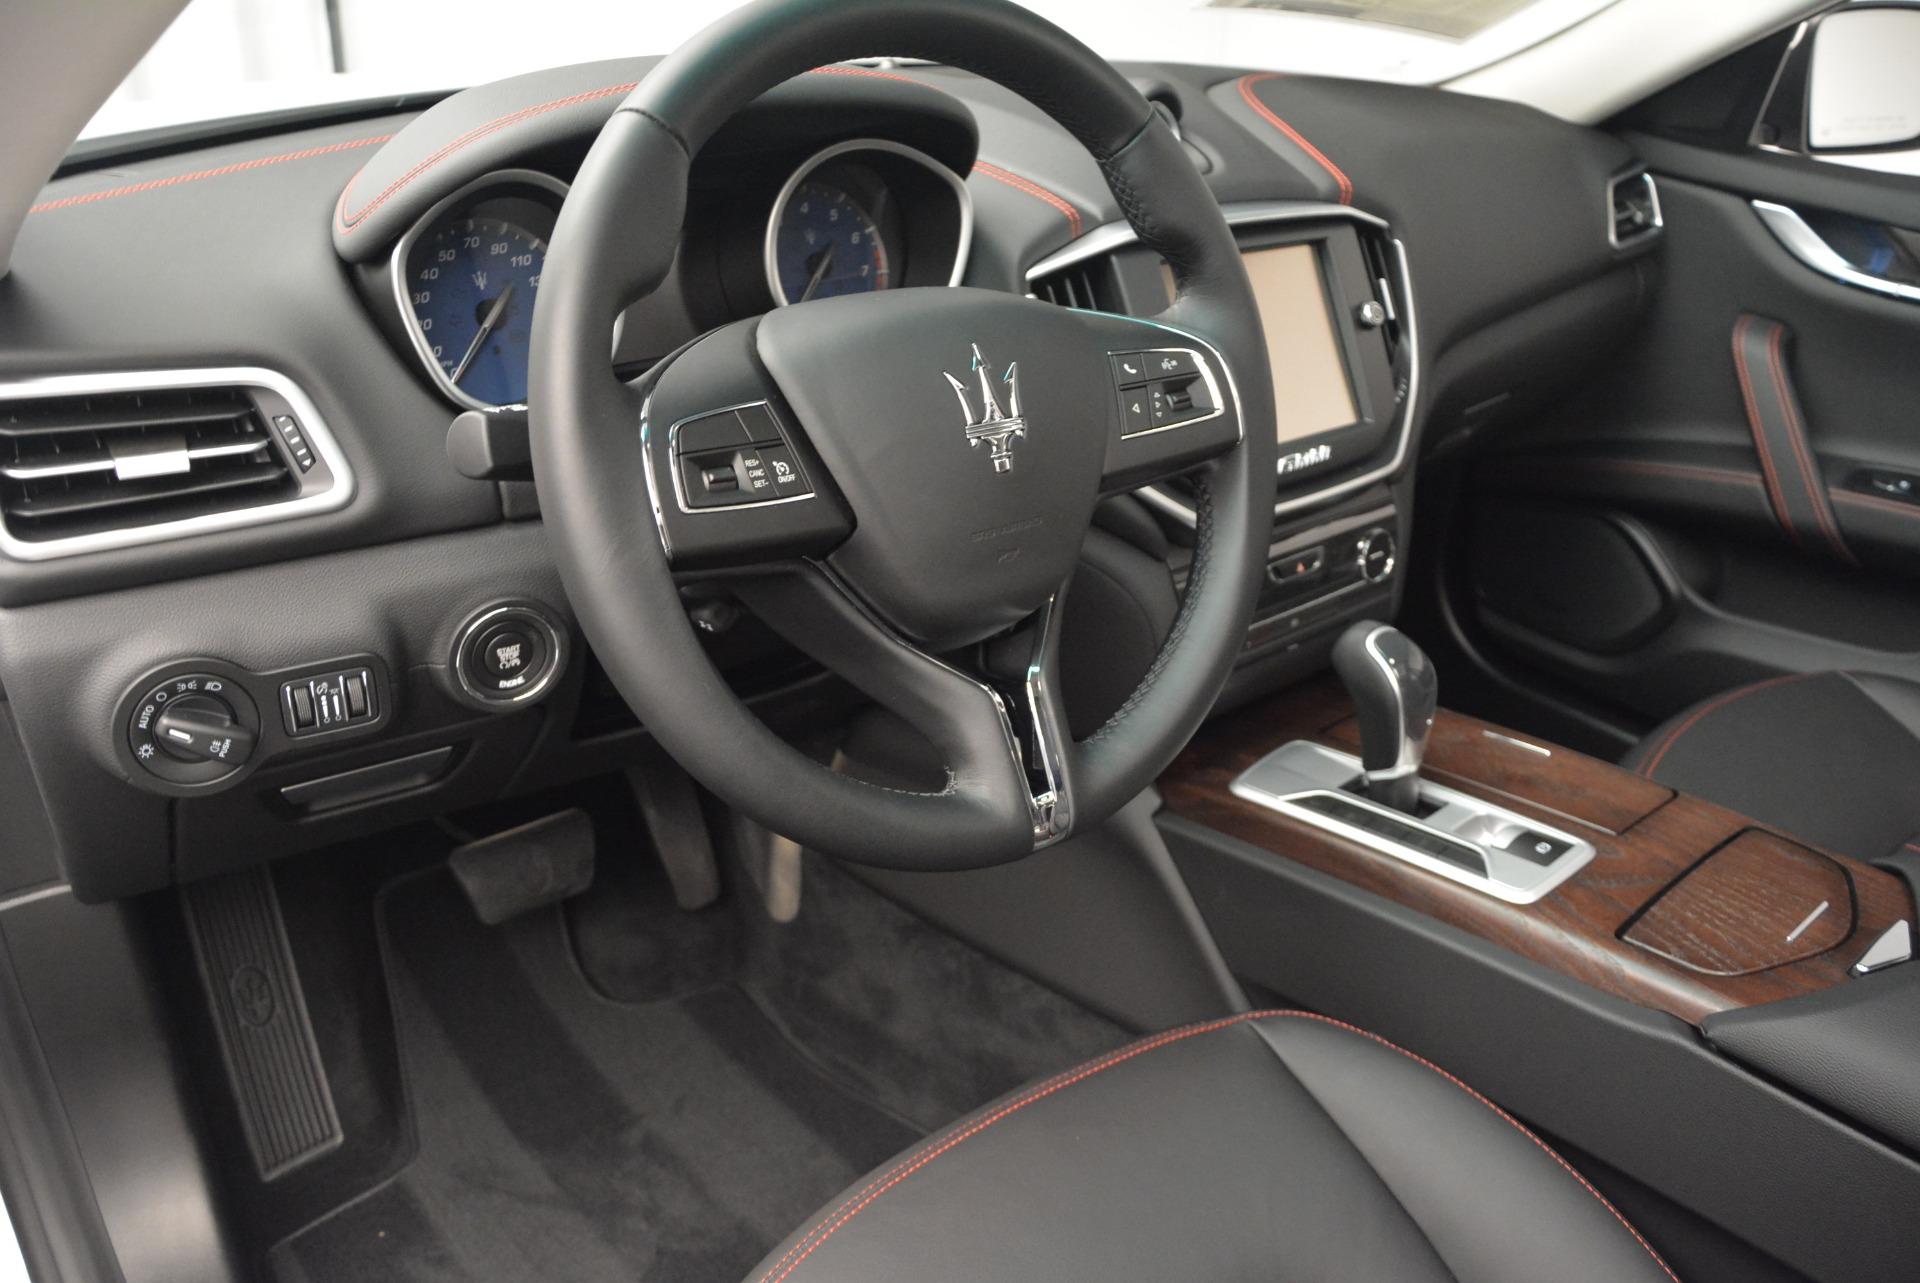 Used 2016 Maserati Ghibli S Q4  EX-LOANER For Sale In Greenwich, CT. Alfa Romeo of Greenwich, W252 669_p13